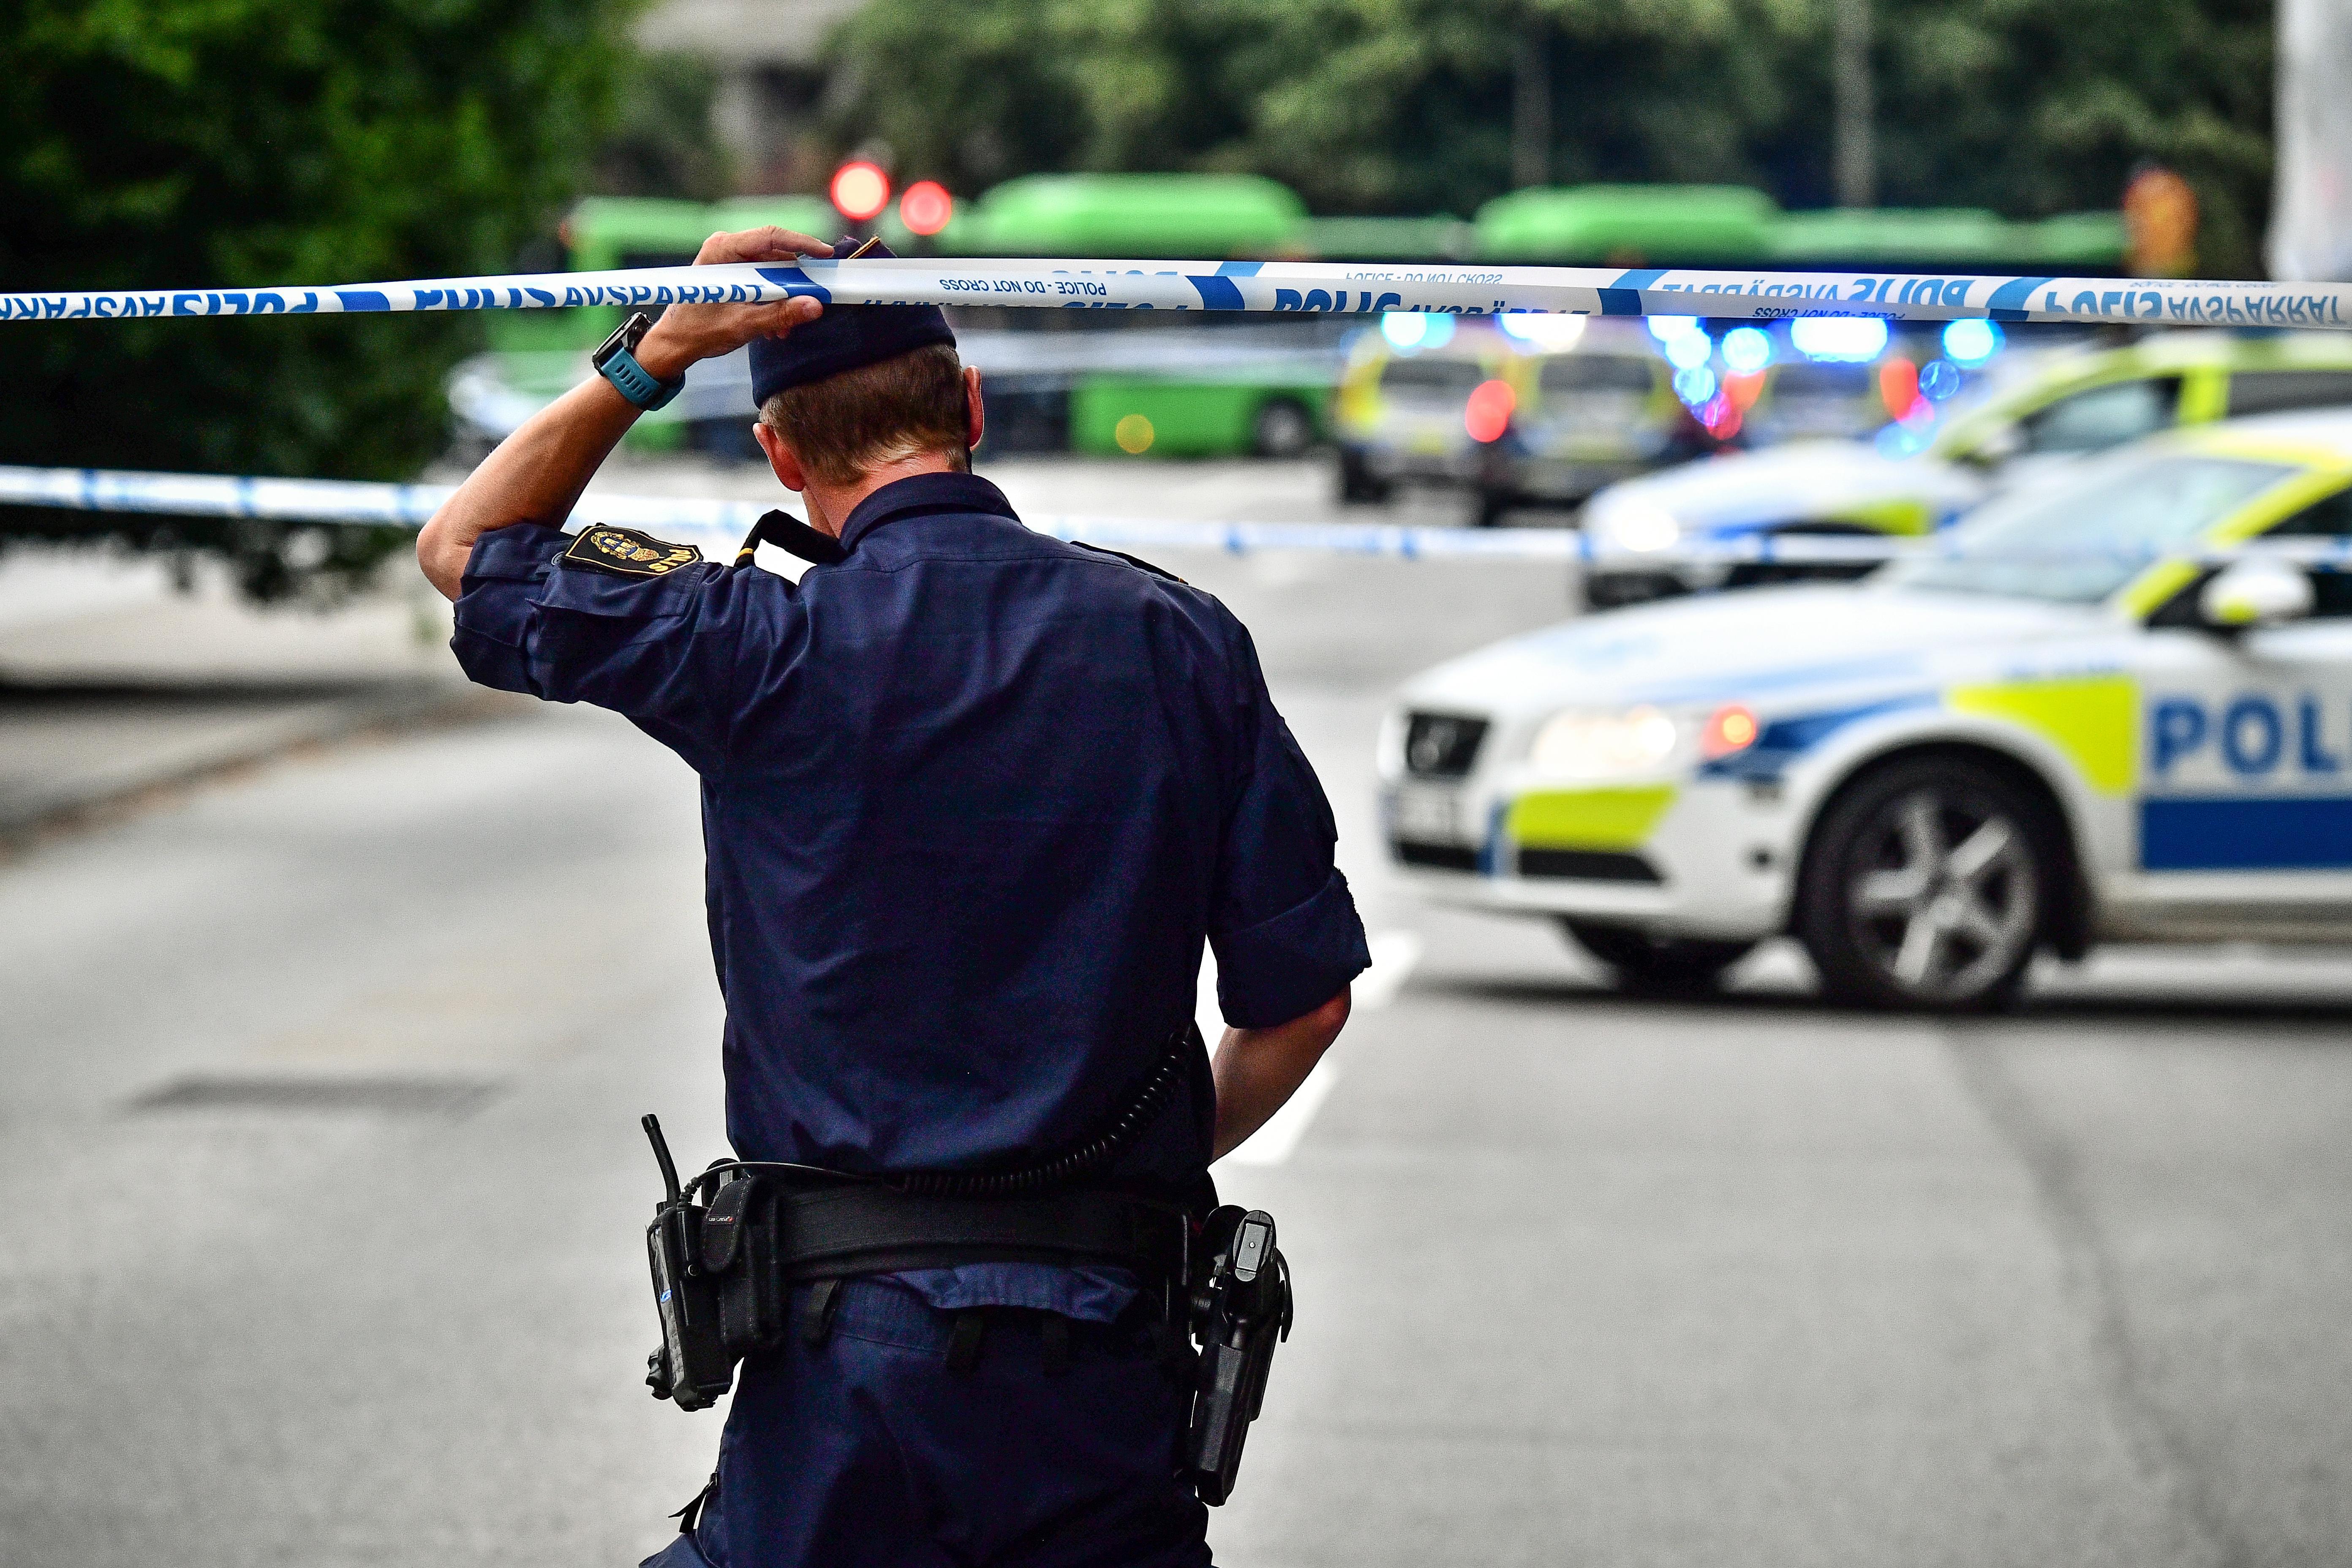 Fyra skottskadade i landskrona